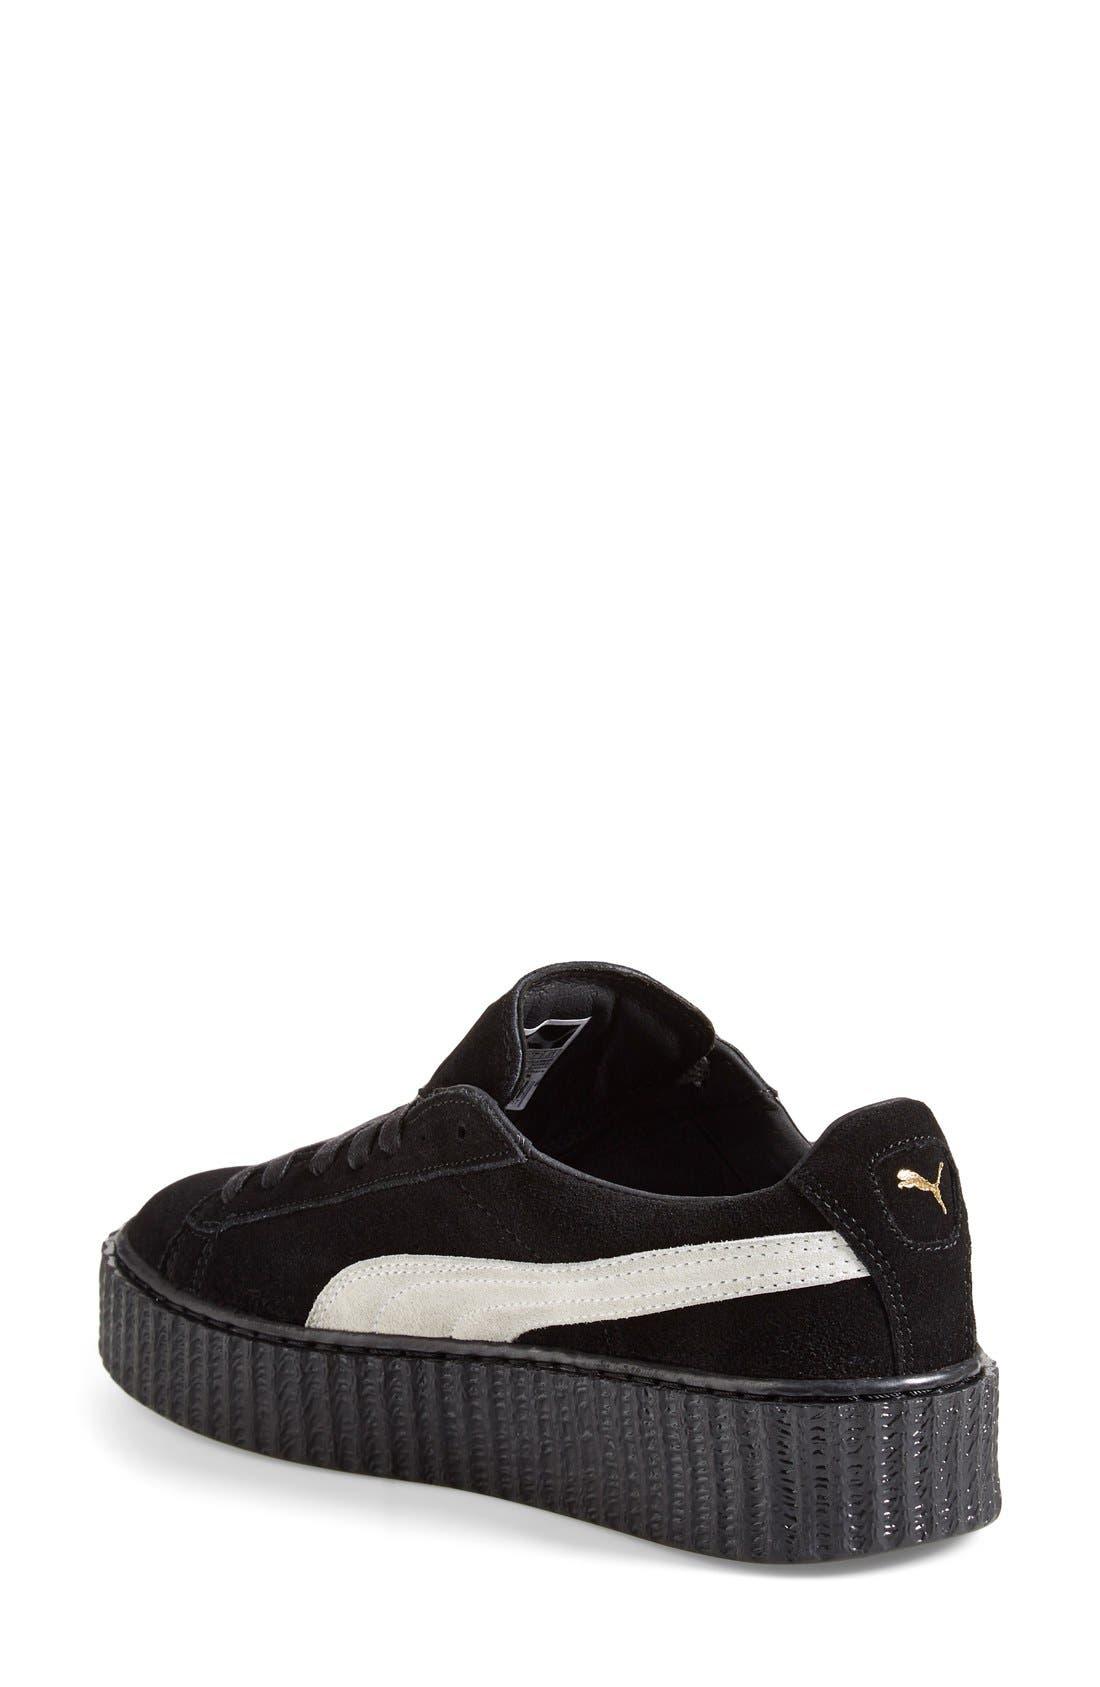 FENTY PUMA by Rihanna Creeper Sneaker,                             Alternate thumbnail 66, color,